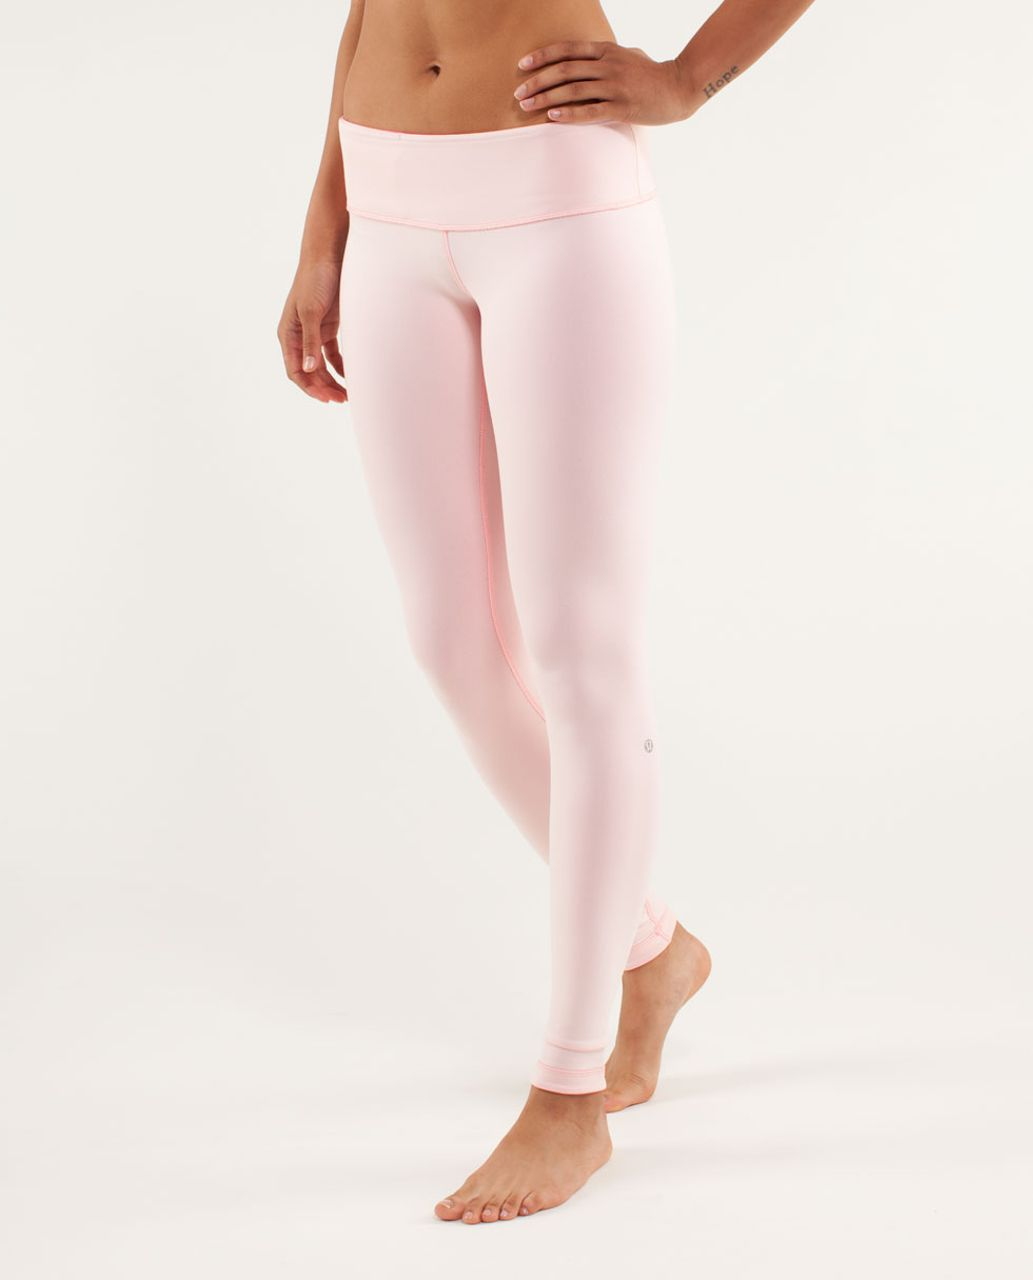 Lululemon Wunder Under Pant *Reversible - Parfait Pink / Pinkelicious